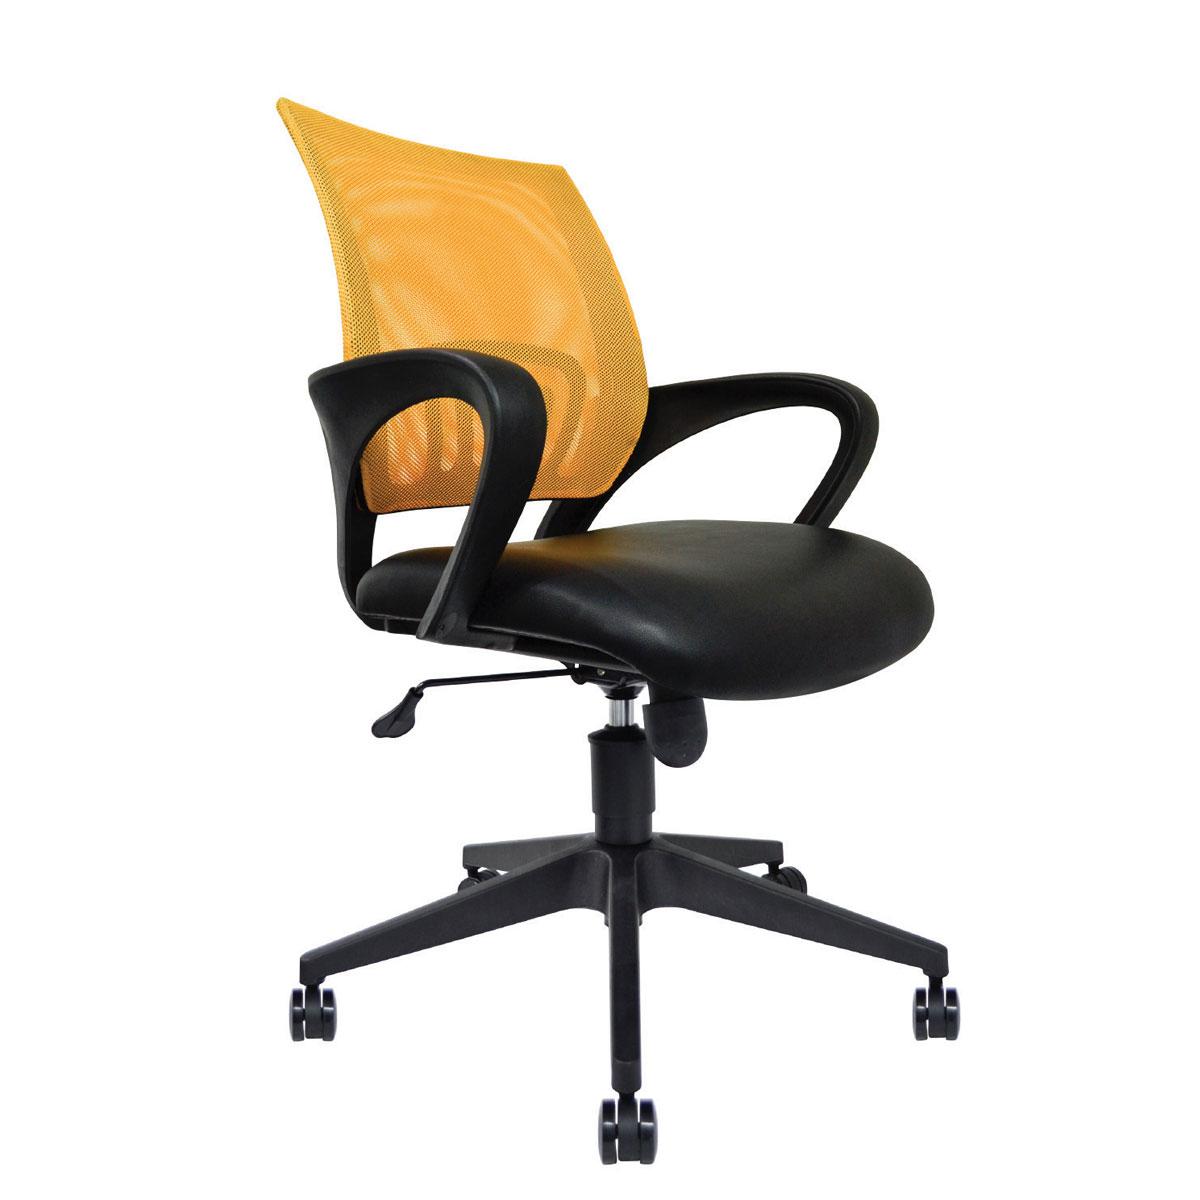 mesh low back chair nt 13. Black Bedroom Furniture Sets. Home Design Ideas